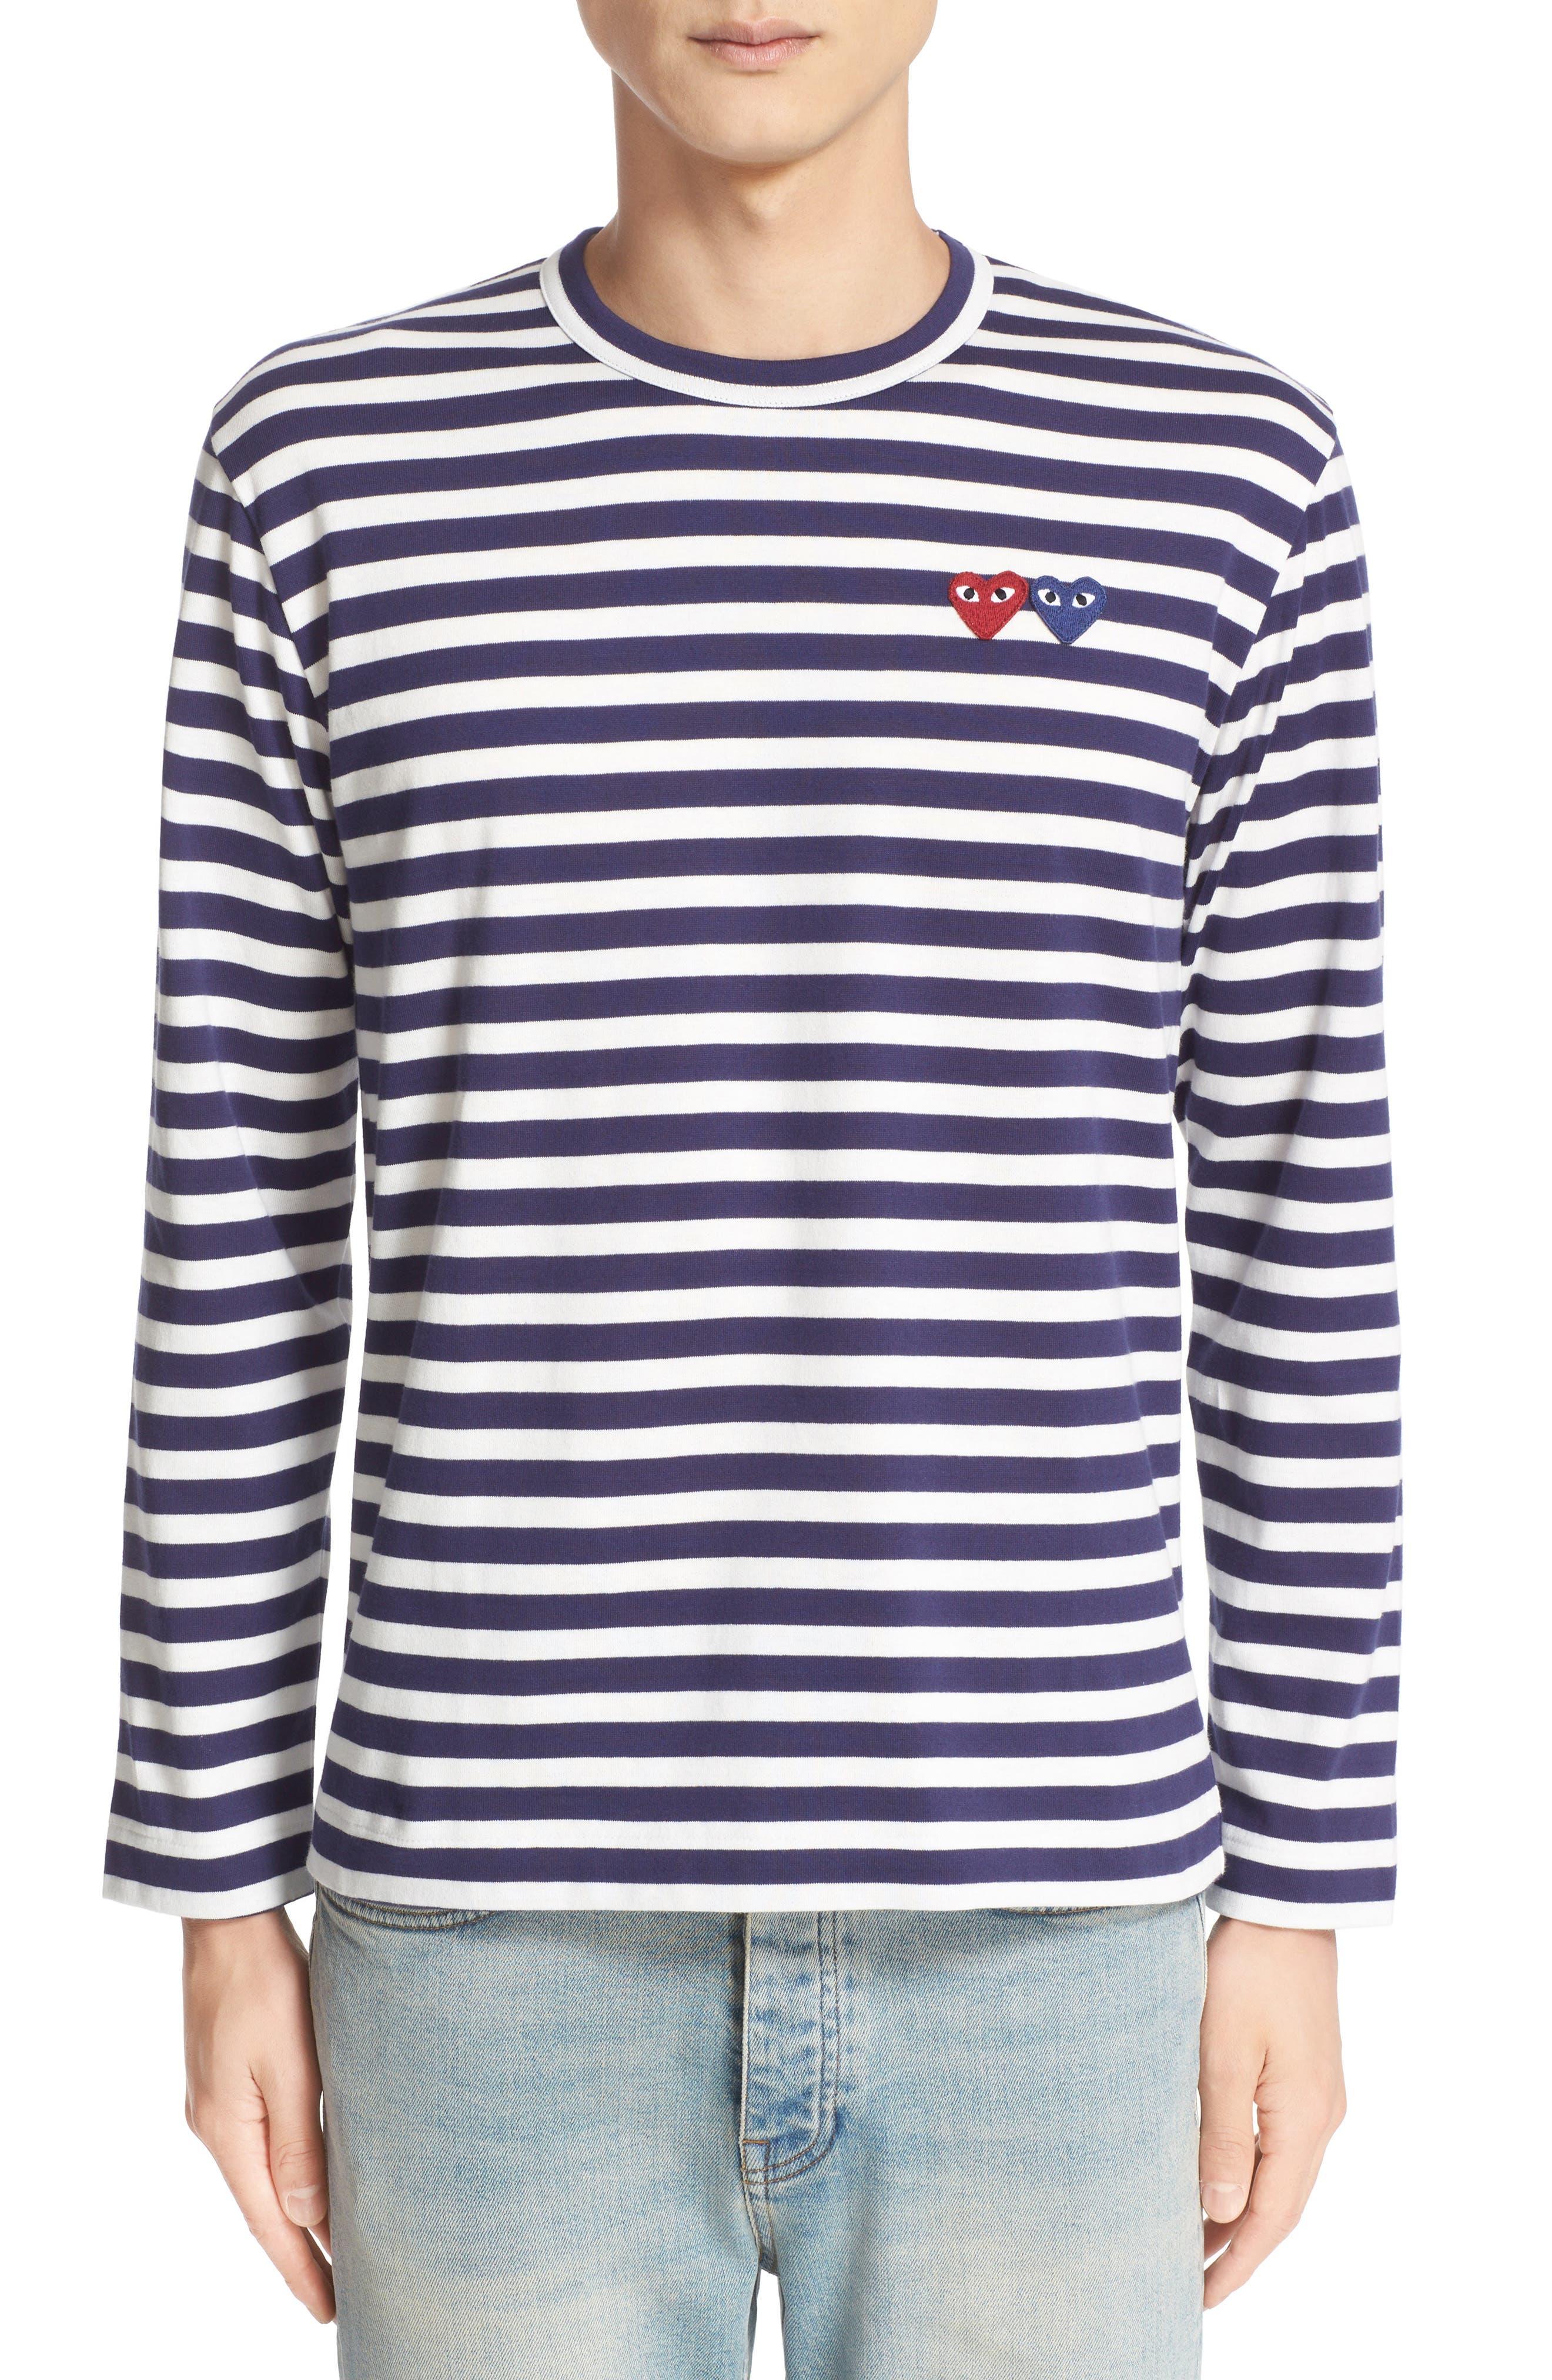 Twin Appliqué Stripe T-Shirt,                             Main thumbnail 1, color,                             NAVY/ WHITE